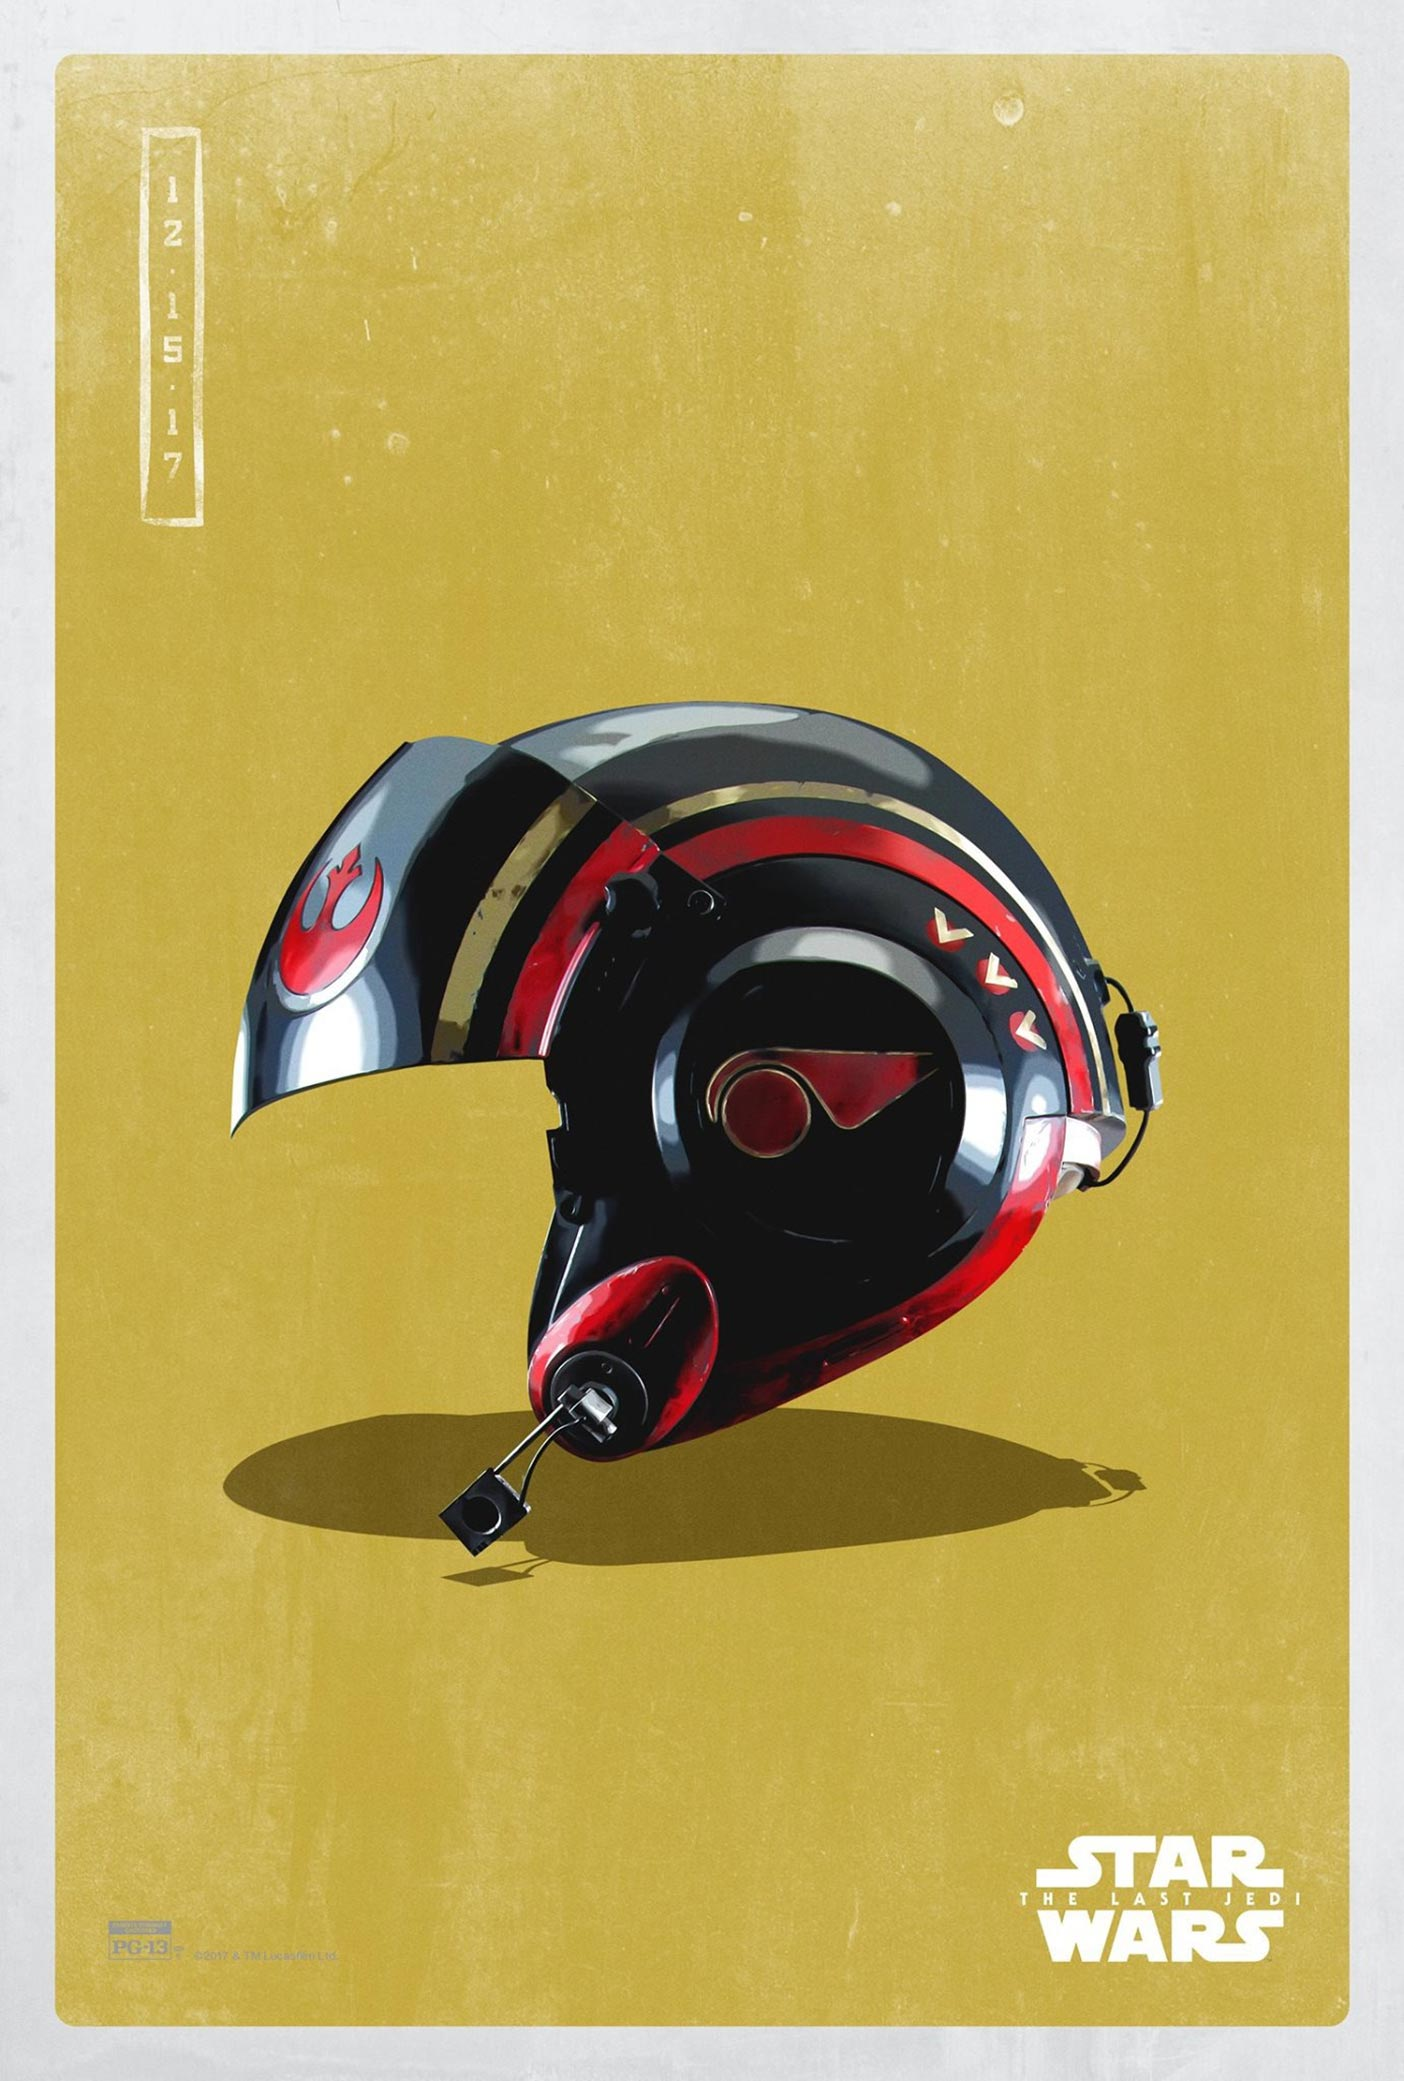 Star Wars: Episode VIII - The Last Jedi Poster #22